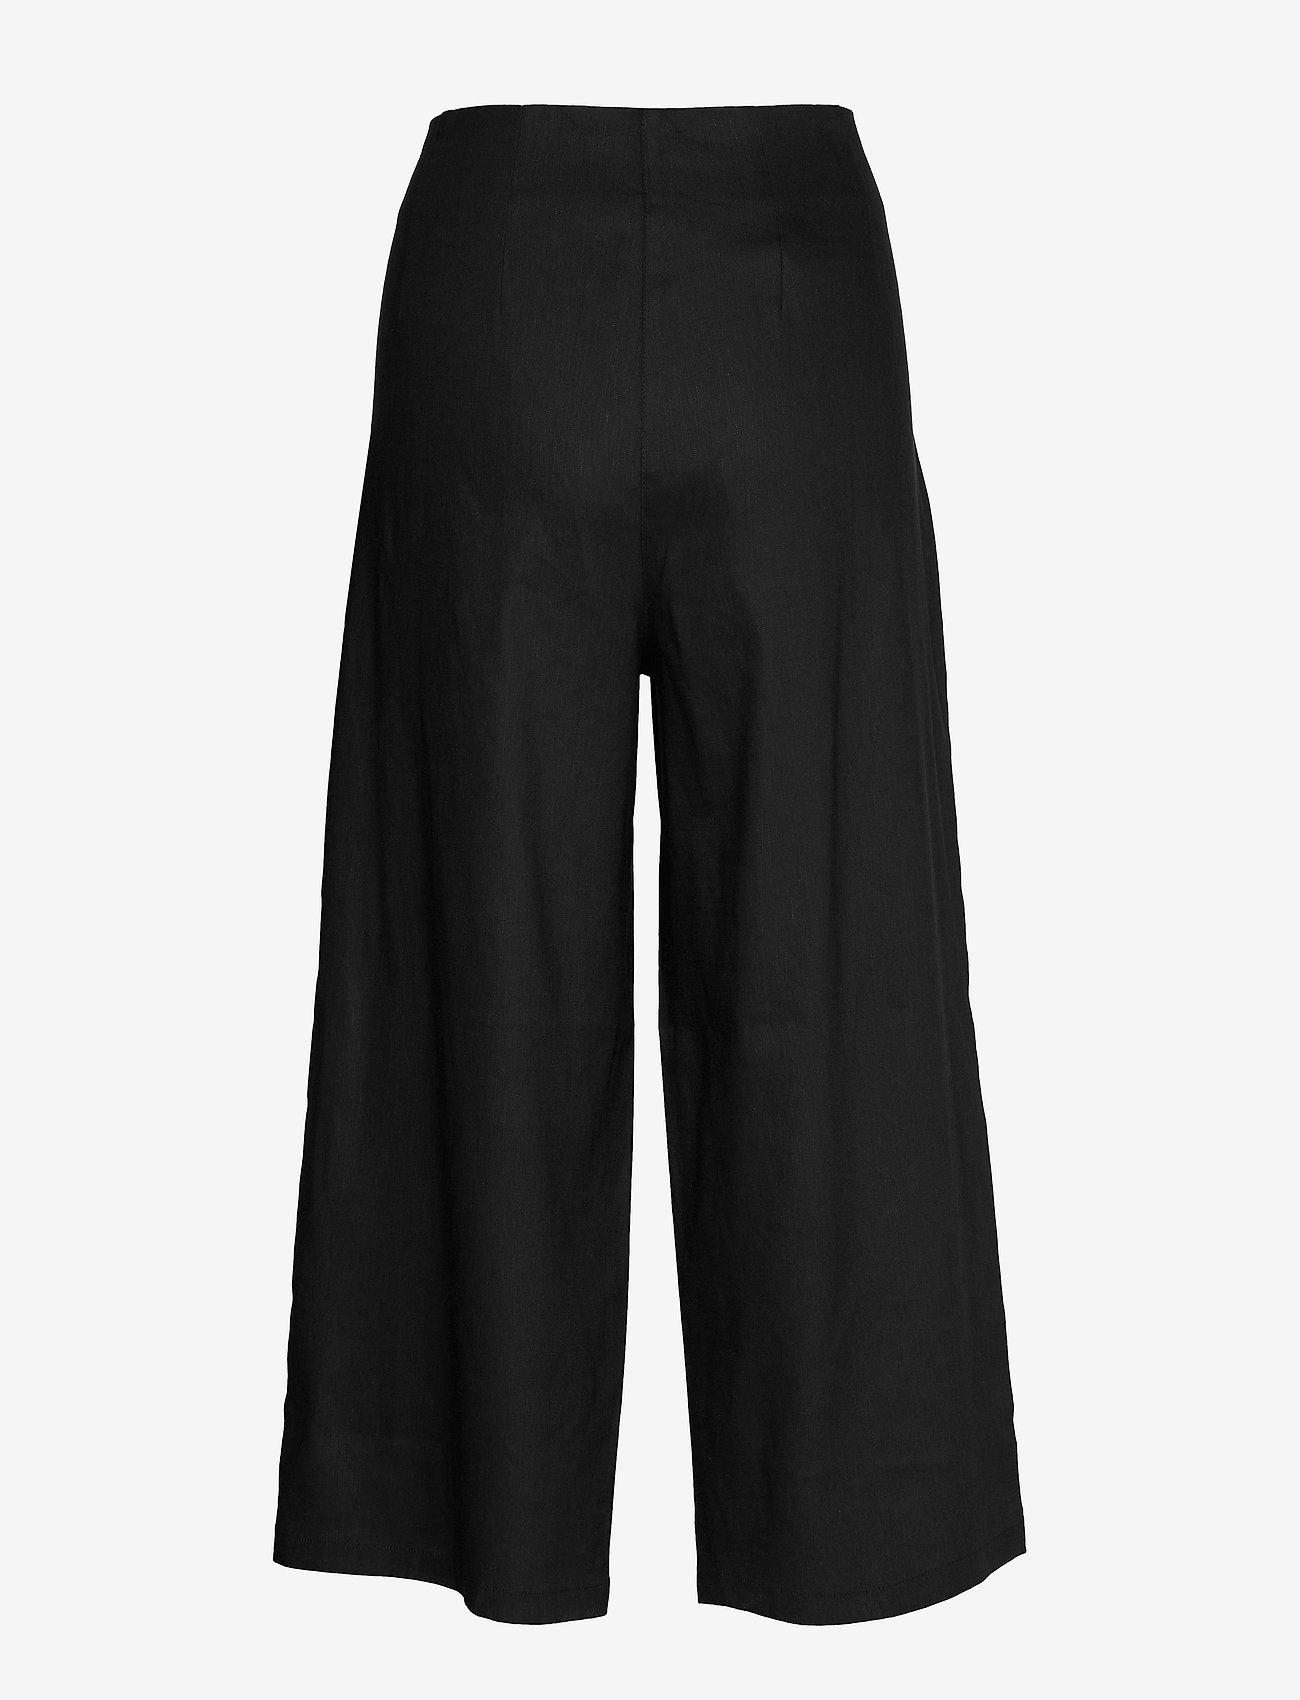 Masai - Paola - spodnie szerokie - black - 1